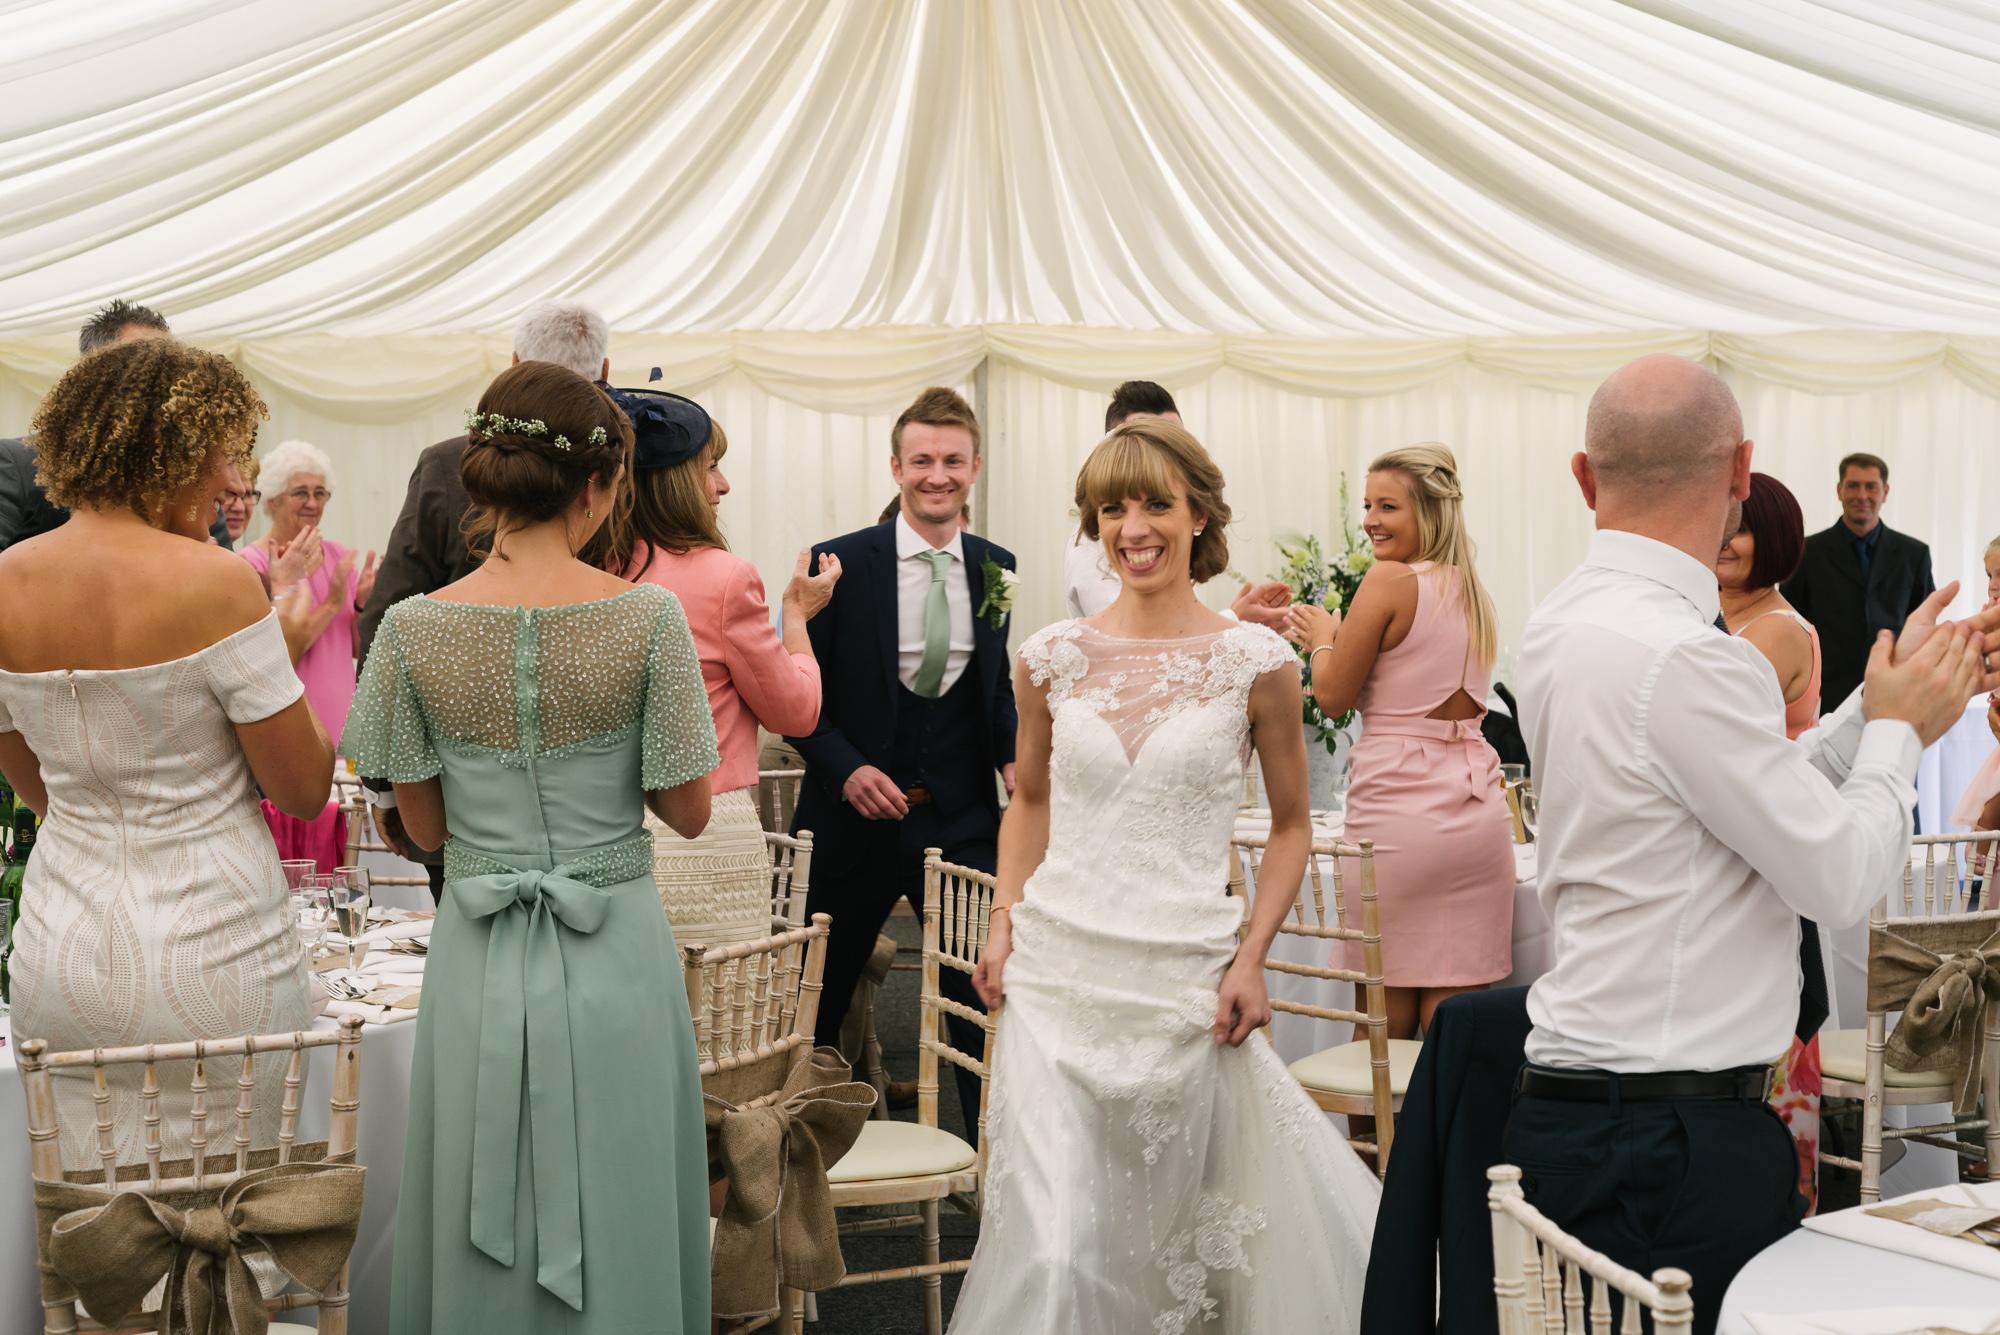 Cricket Club Wedding Tea Party Eversholt Bedfordshire-47